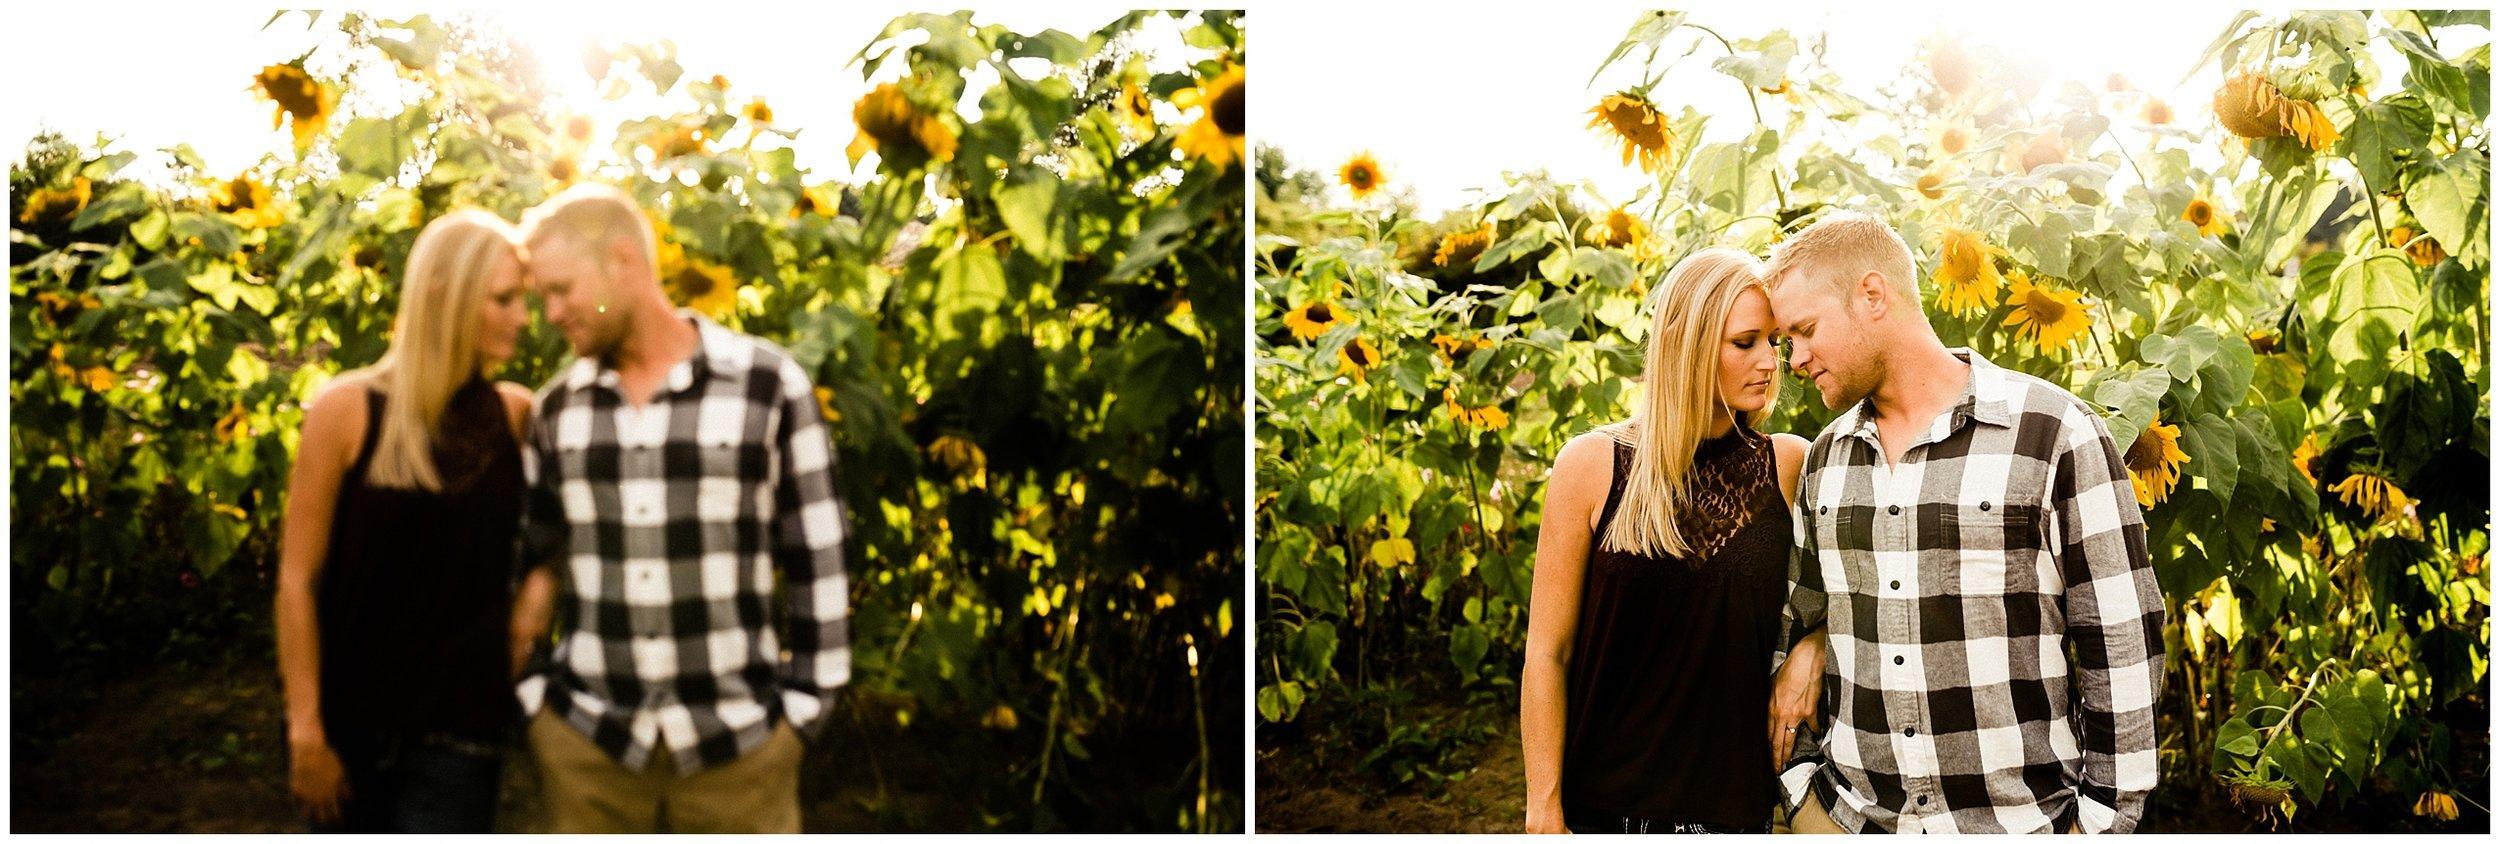 Ben + Haily | Engaged #kyleepaigephotography_1132.jpg